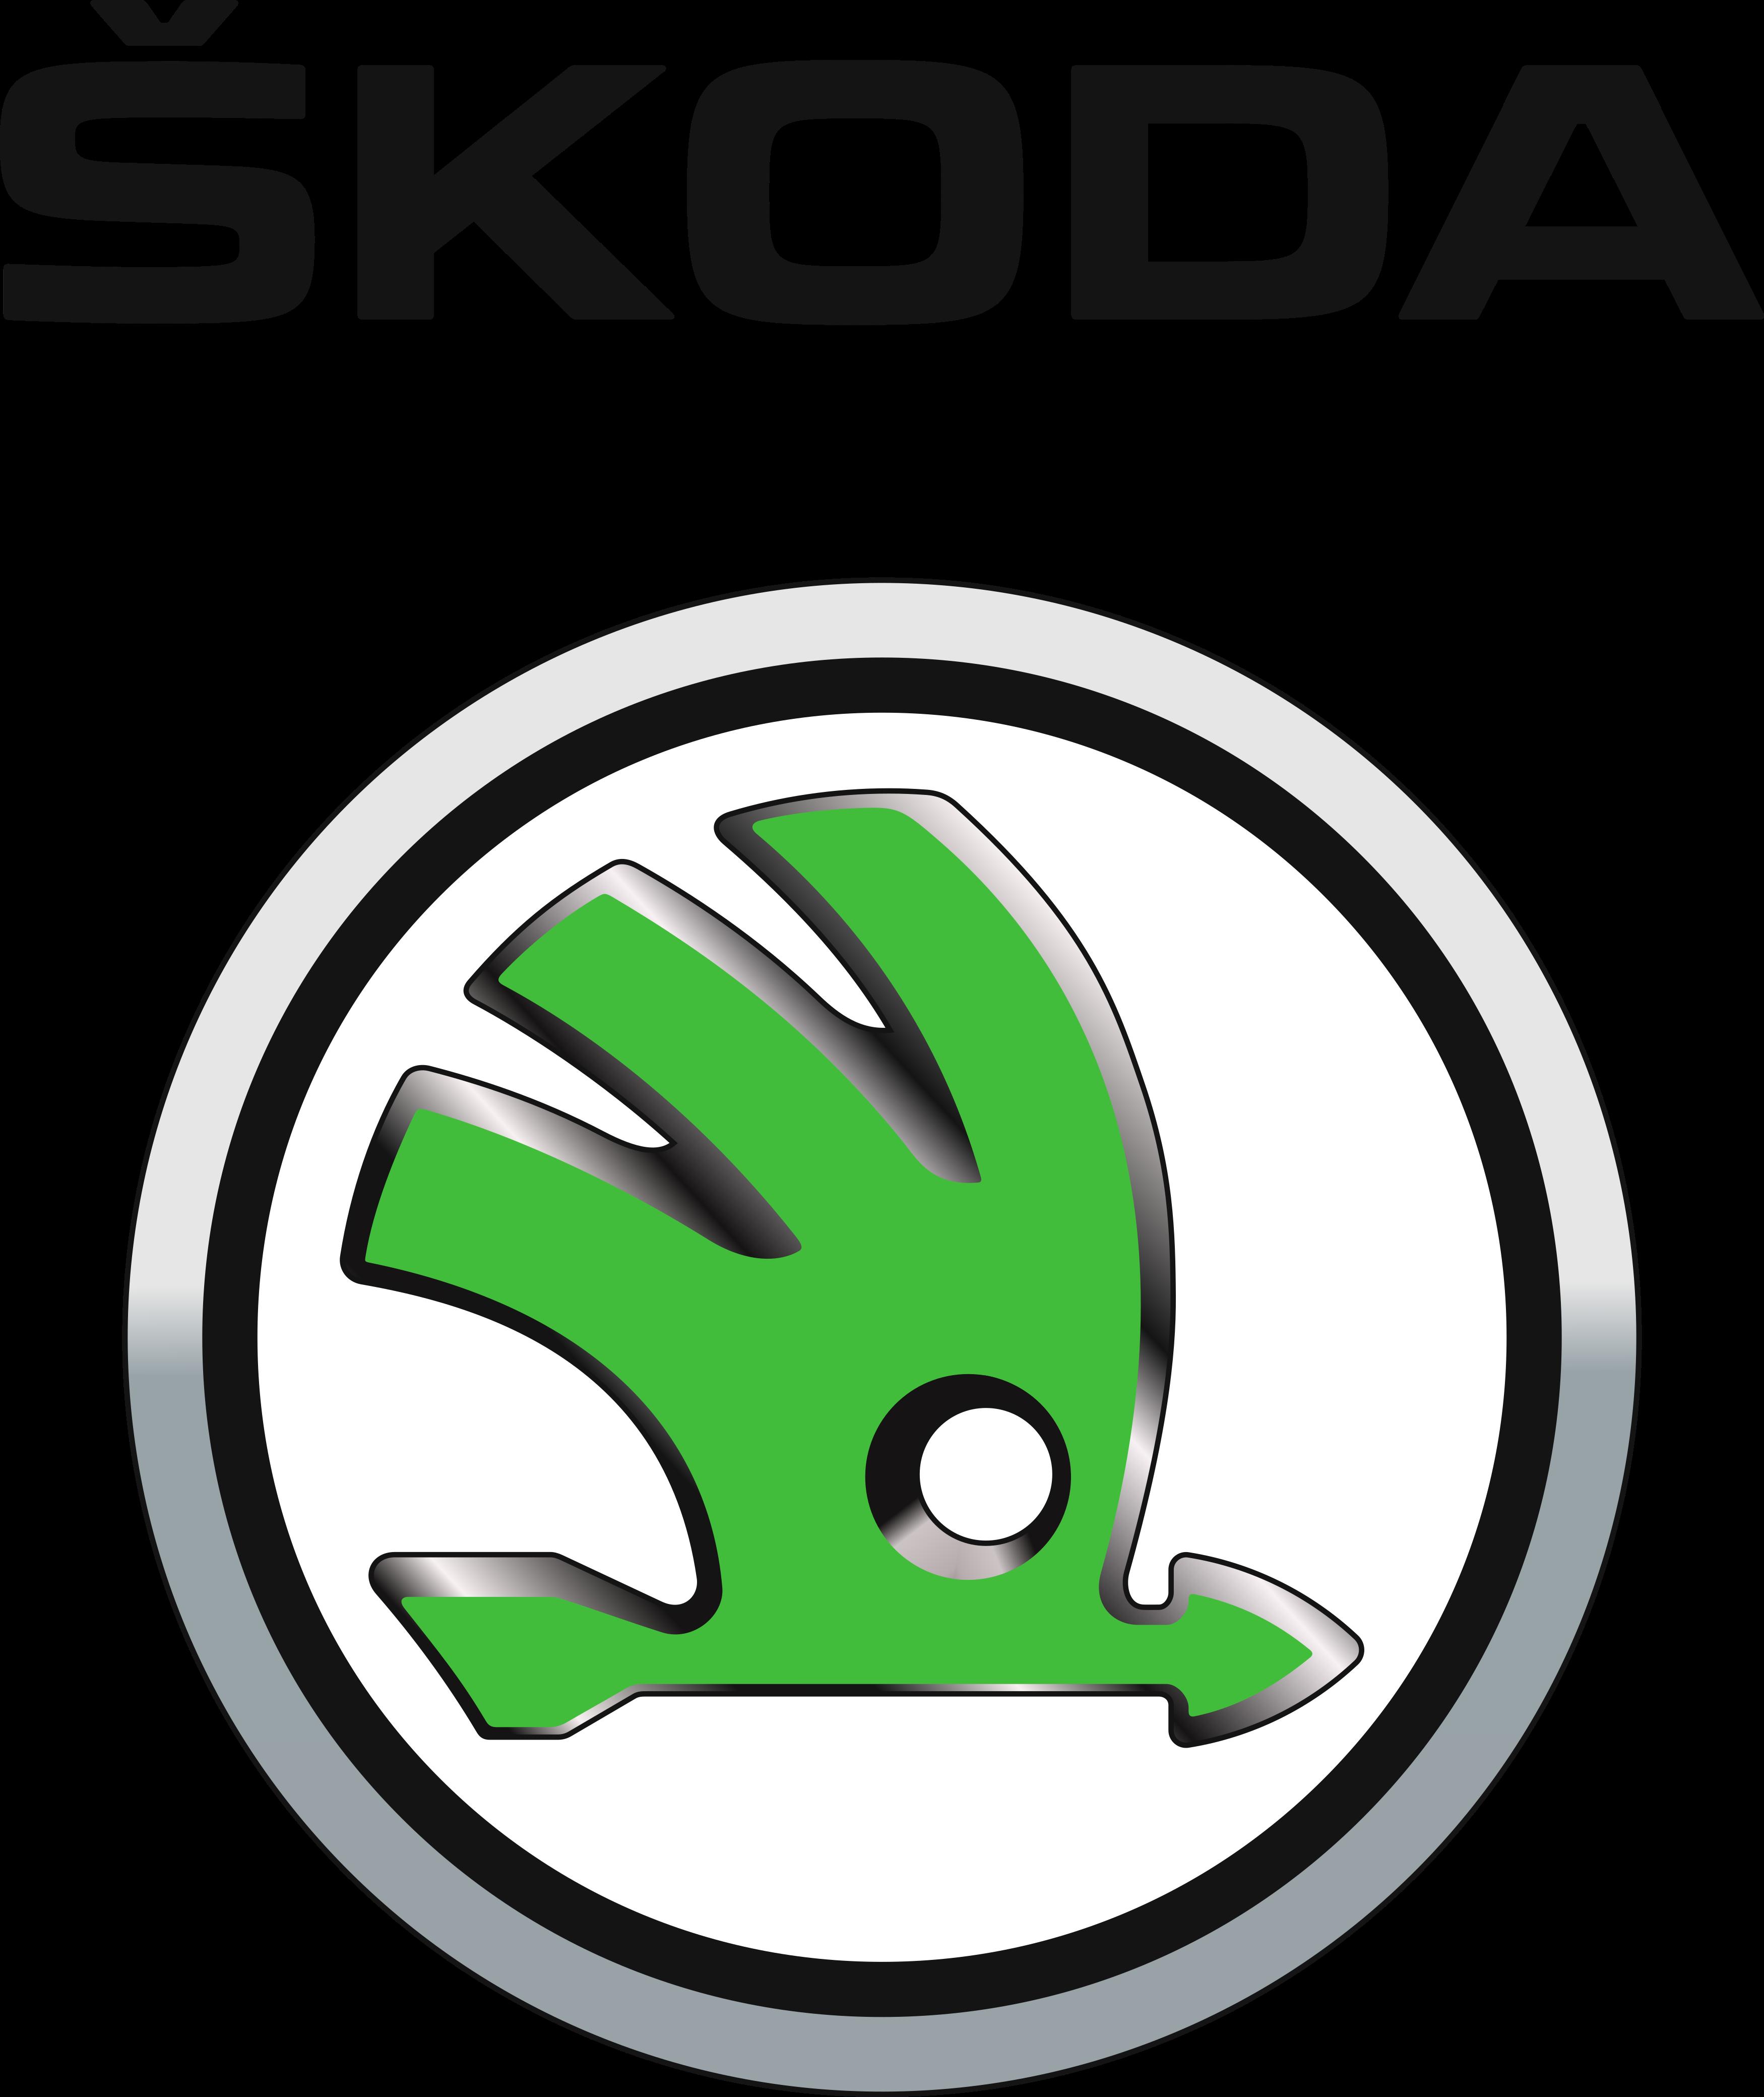 skoda-auto-logo-1